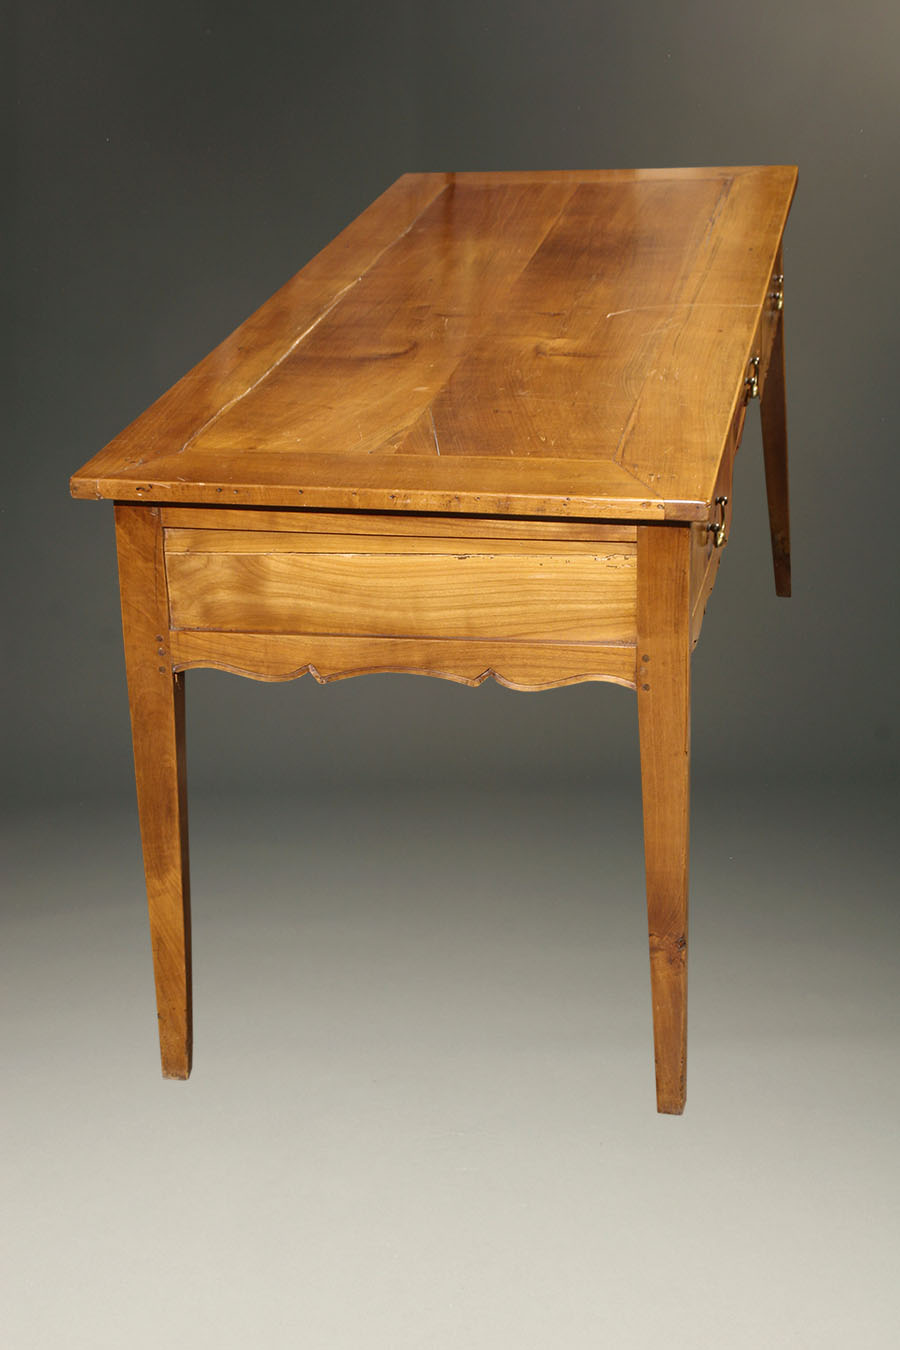 Home Furniture Desks Writing Tables